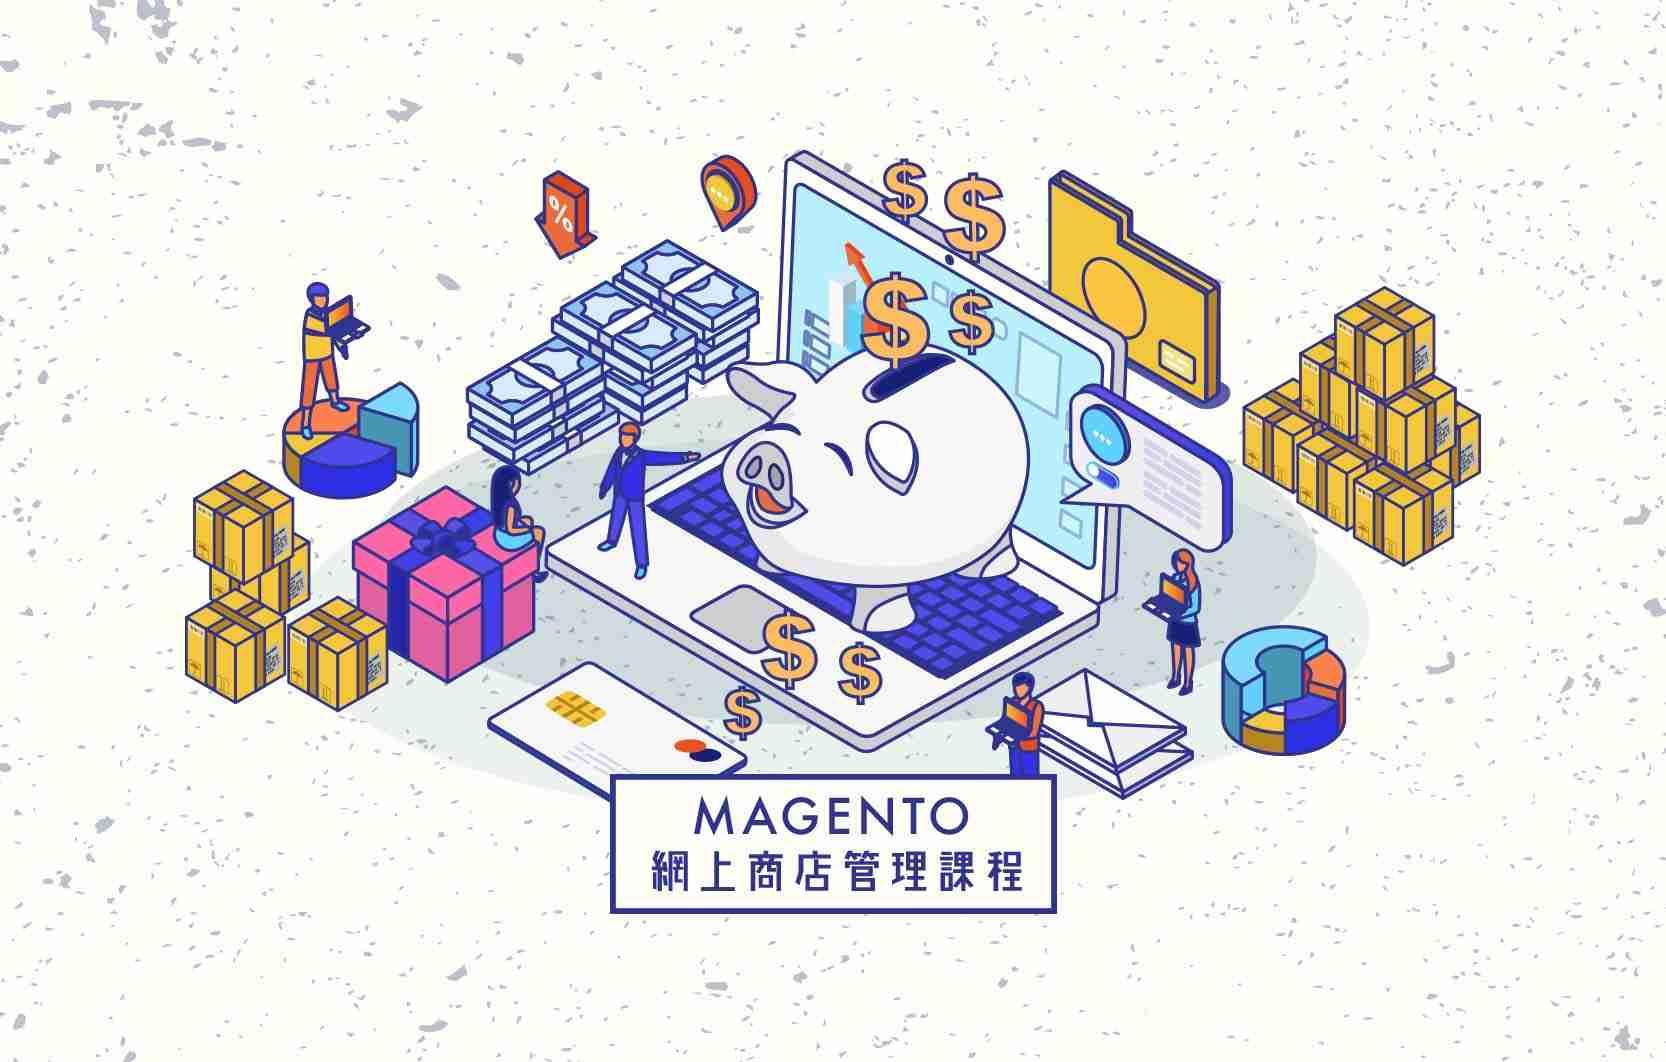 Magento 網上商店管理課程